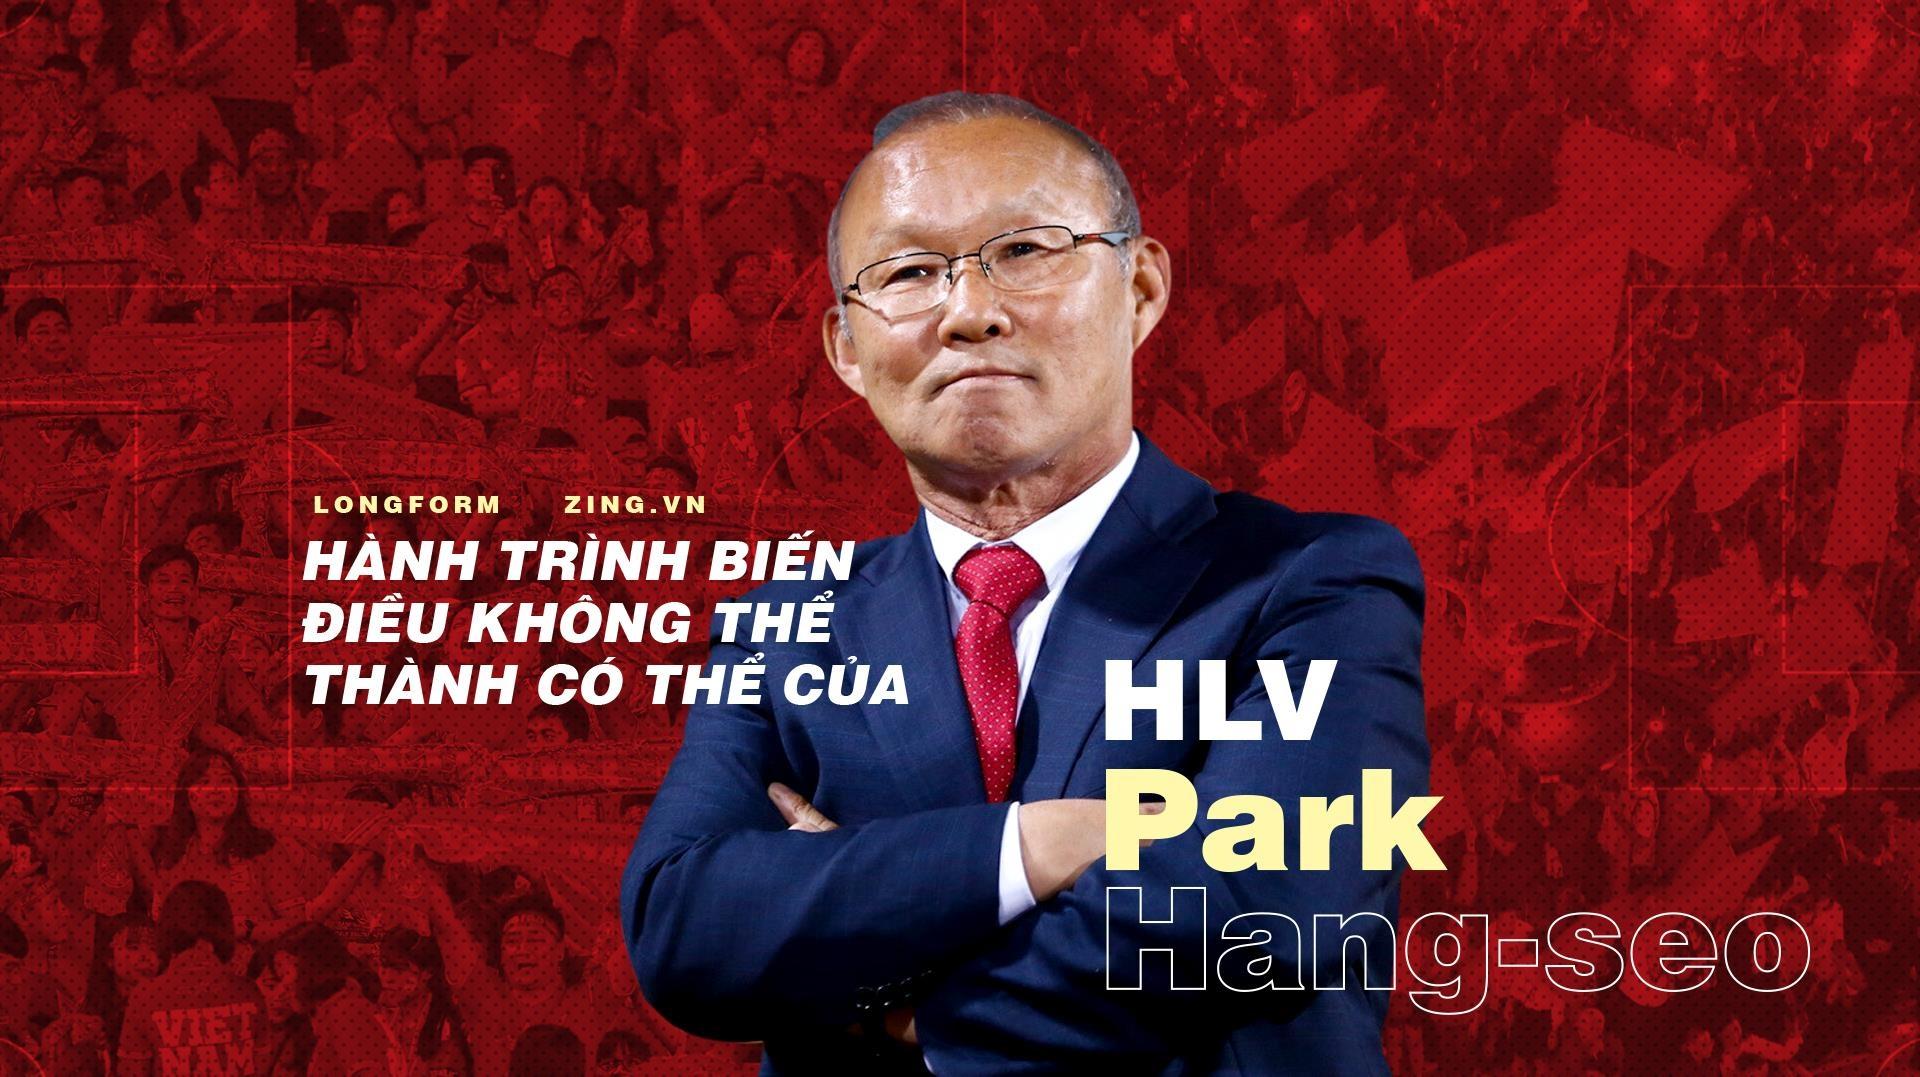 Hanh trinh bien dieu khong the thanh co the cua HLV Park Hang-seo hinh anh 2